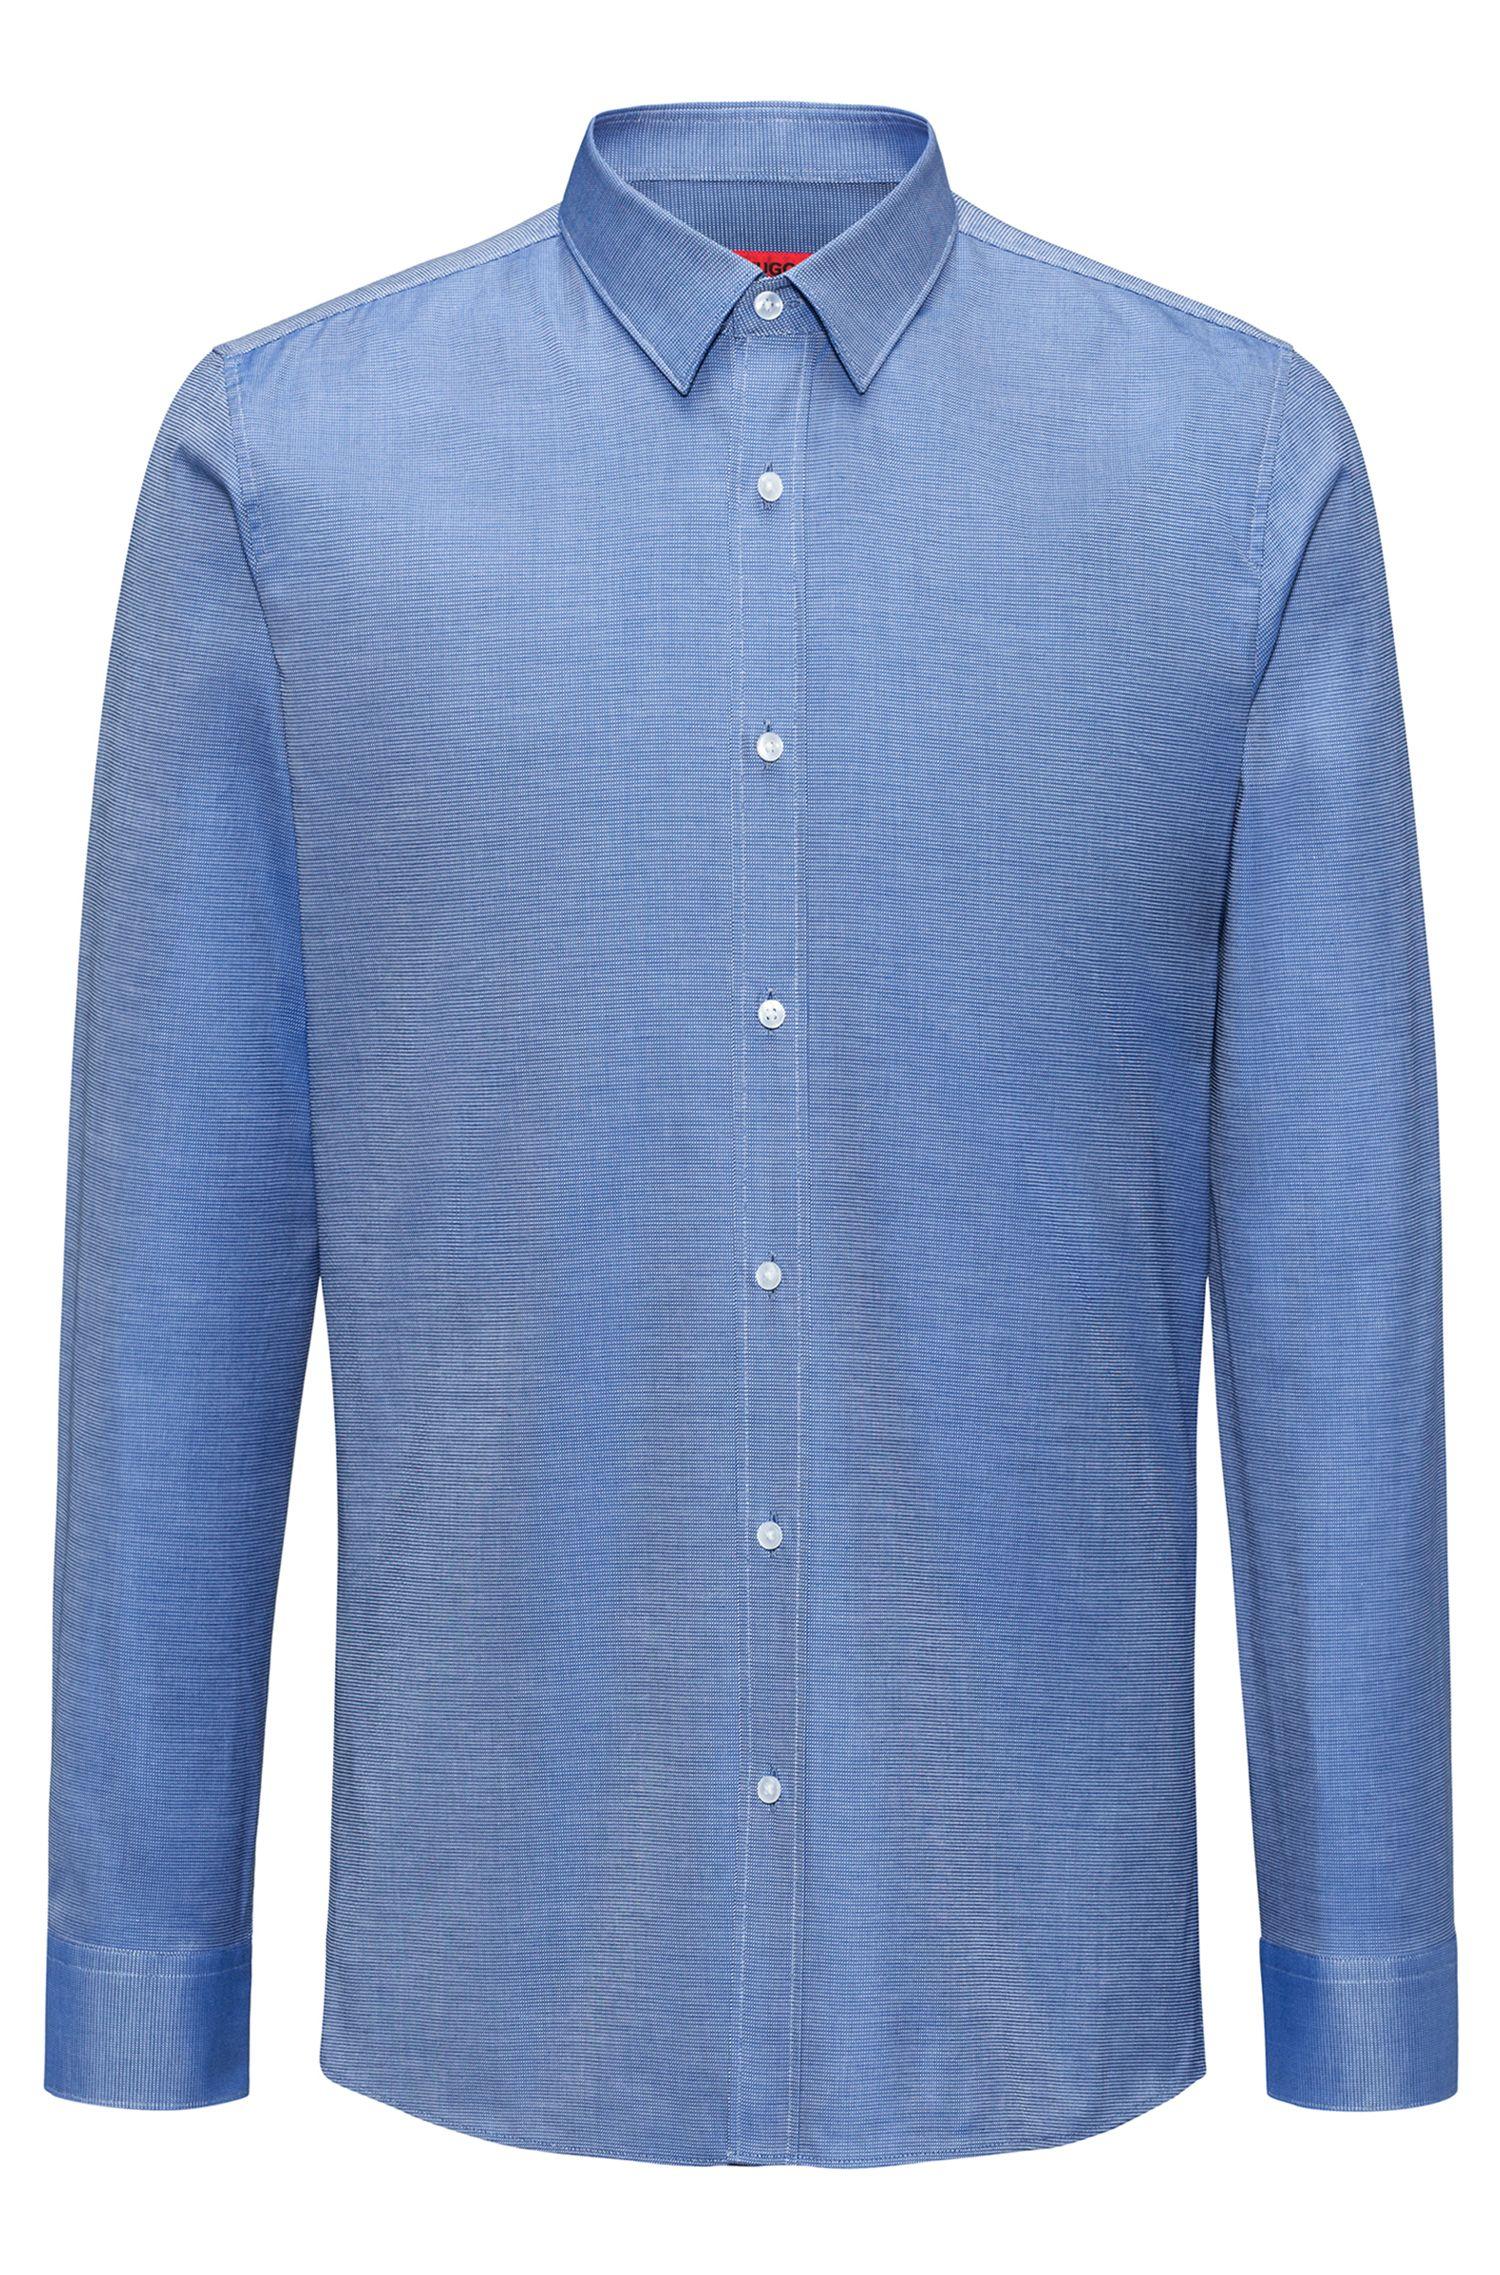 Pindot Cotton Dress Shirt, Extra Slim Fit | Elisha